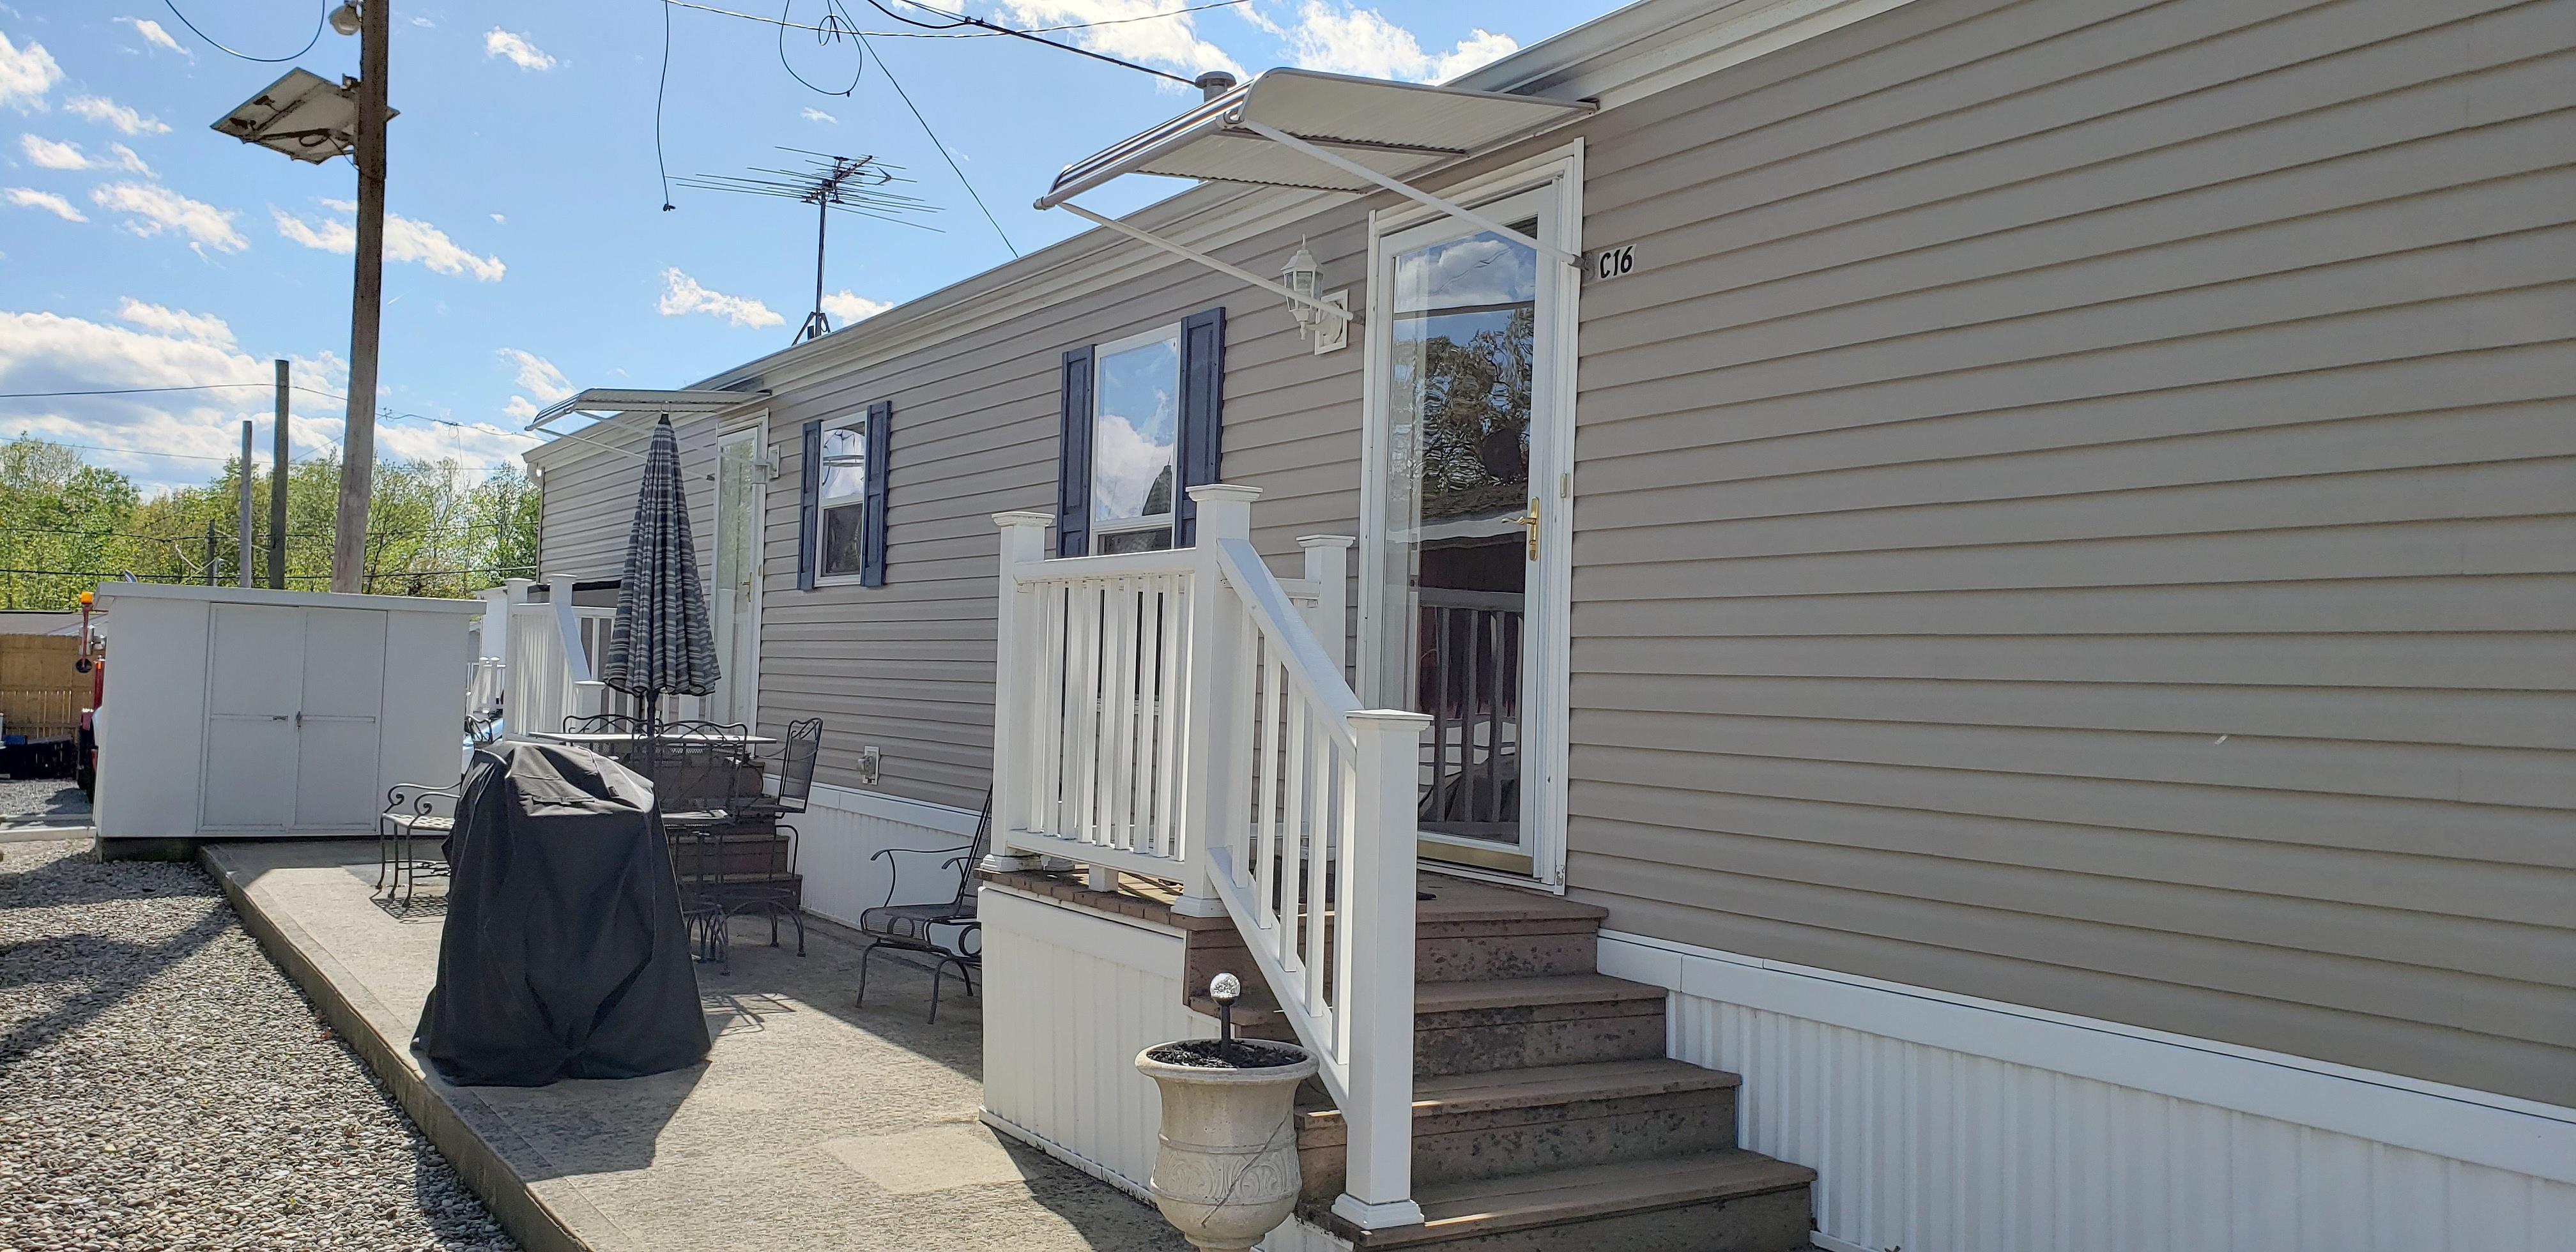 2 Bedrooms / 1 Bathrooms - Est. $566.00 / Month* for rent in Edison, NJ